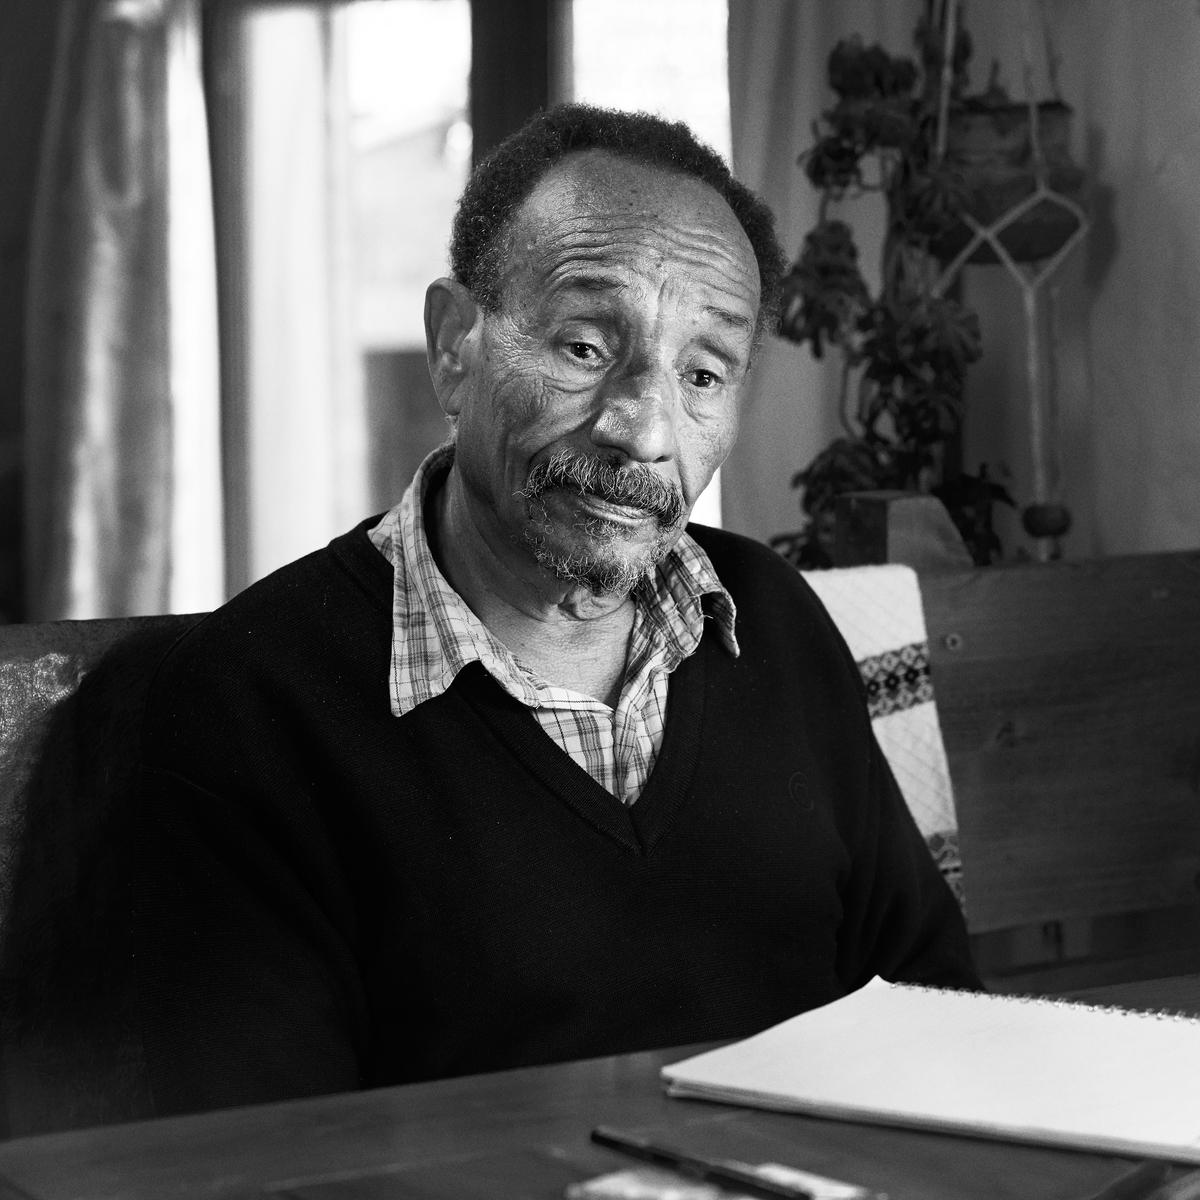 Farmer, philosopher and essayist